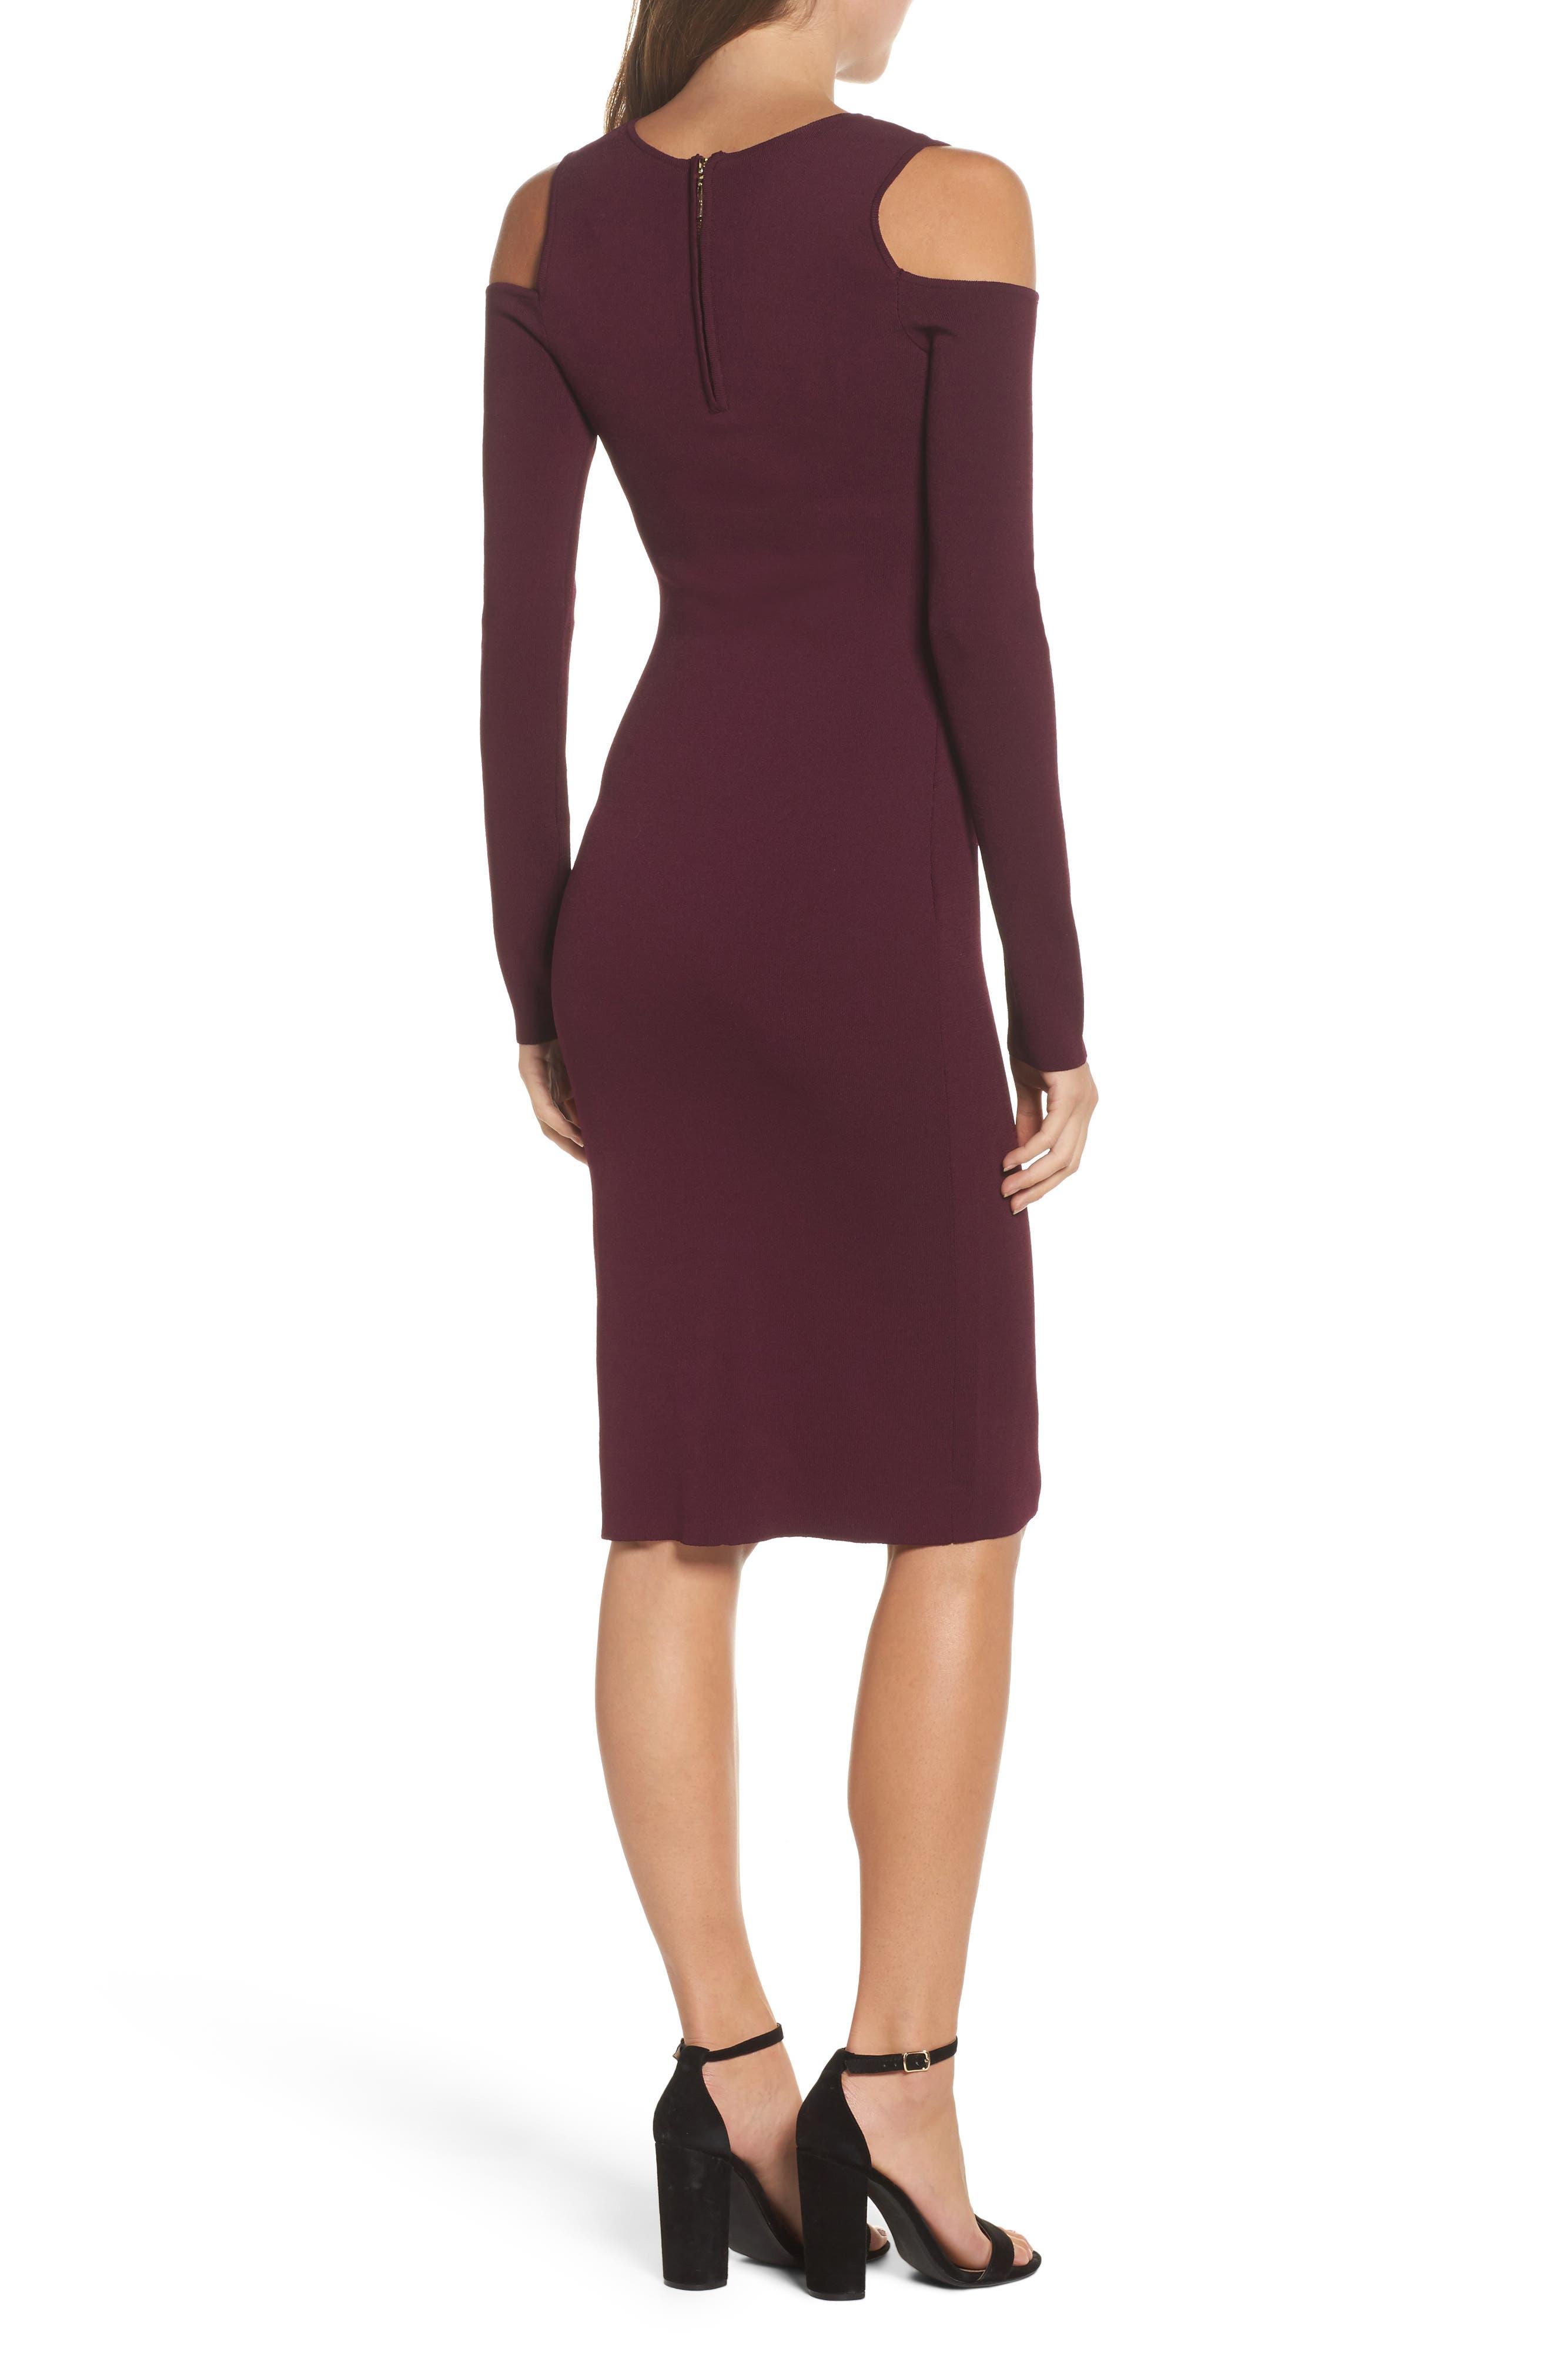 ELIZA J, Cold Shoulder Knit Body-Con Dress, Alternate thumbnail 2, color, 500